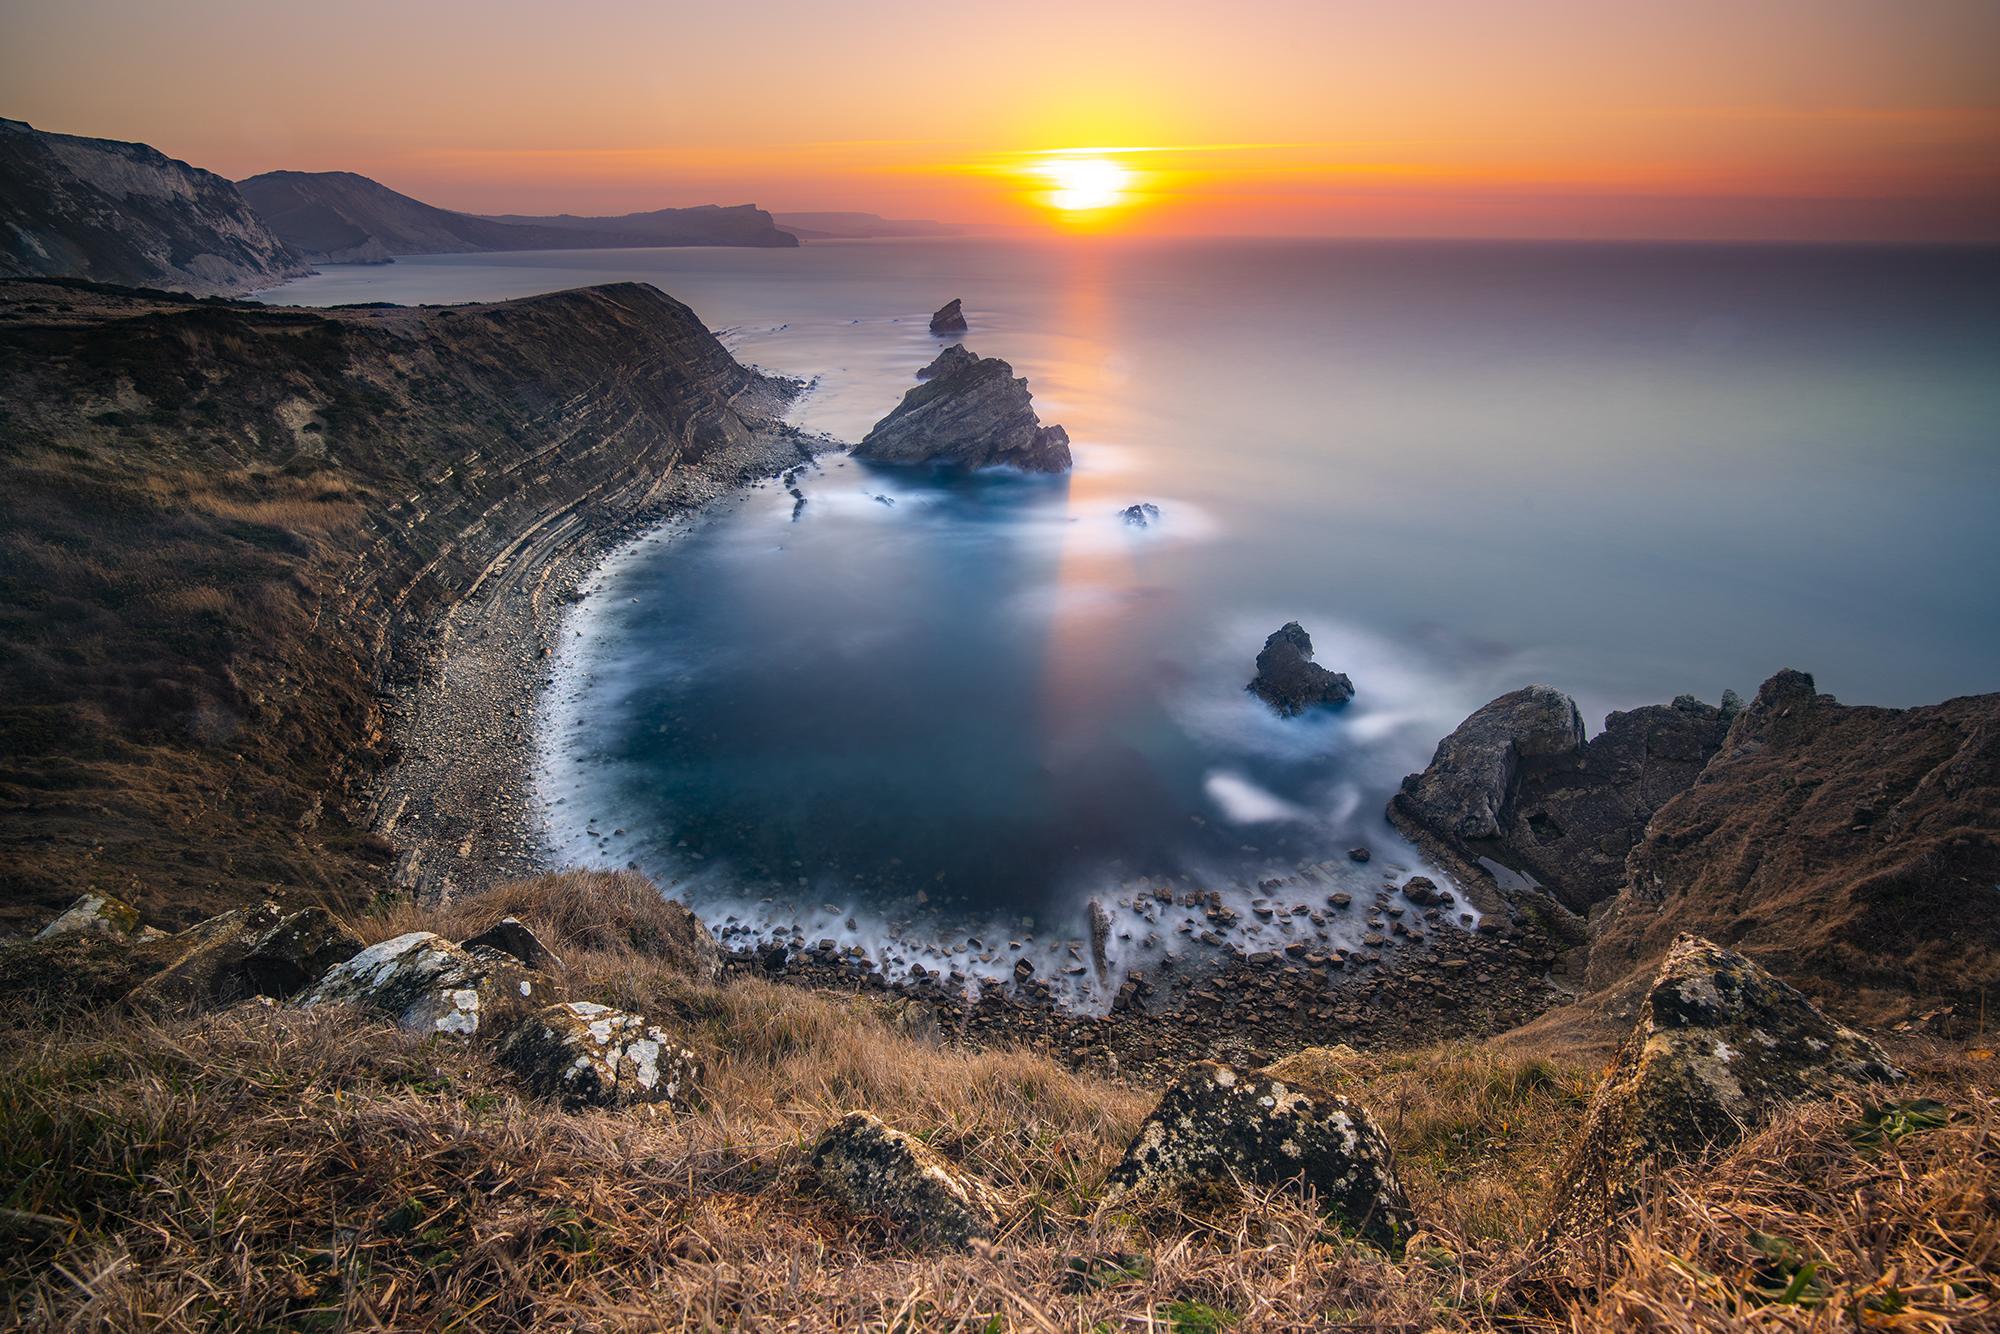 639 seconds - Mupe Bay, Dorset